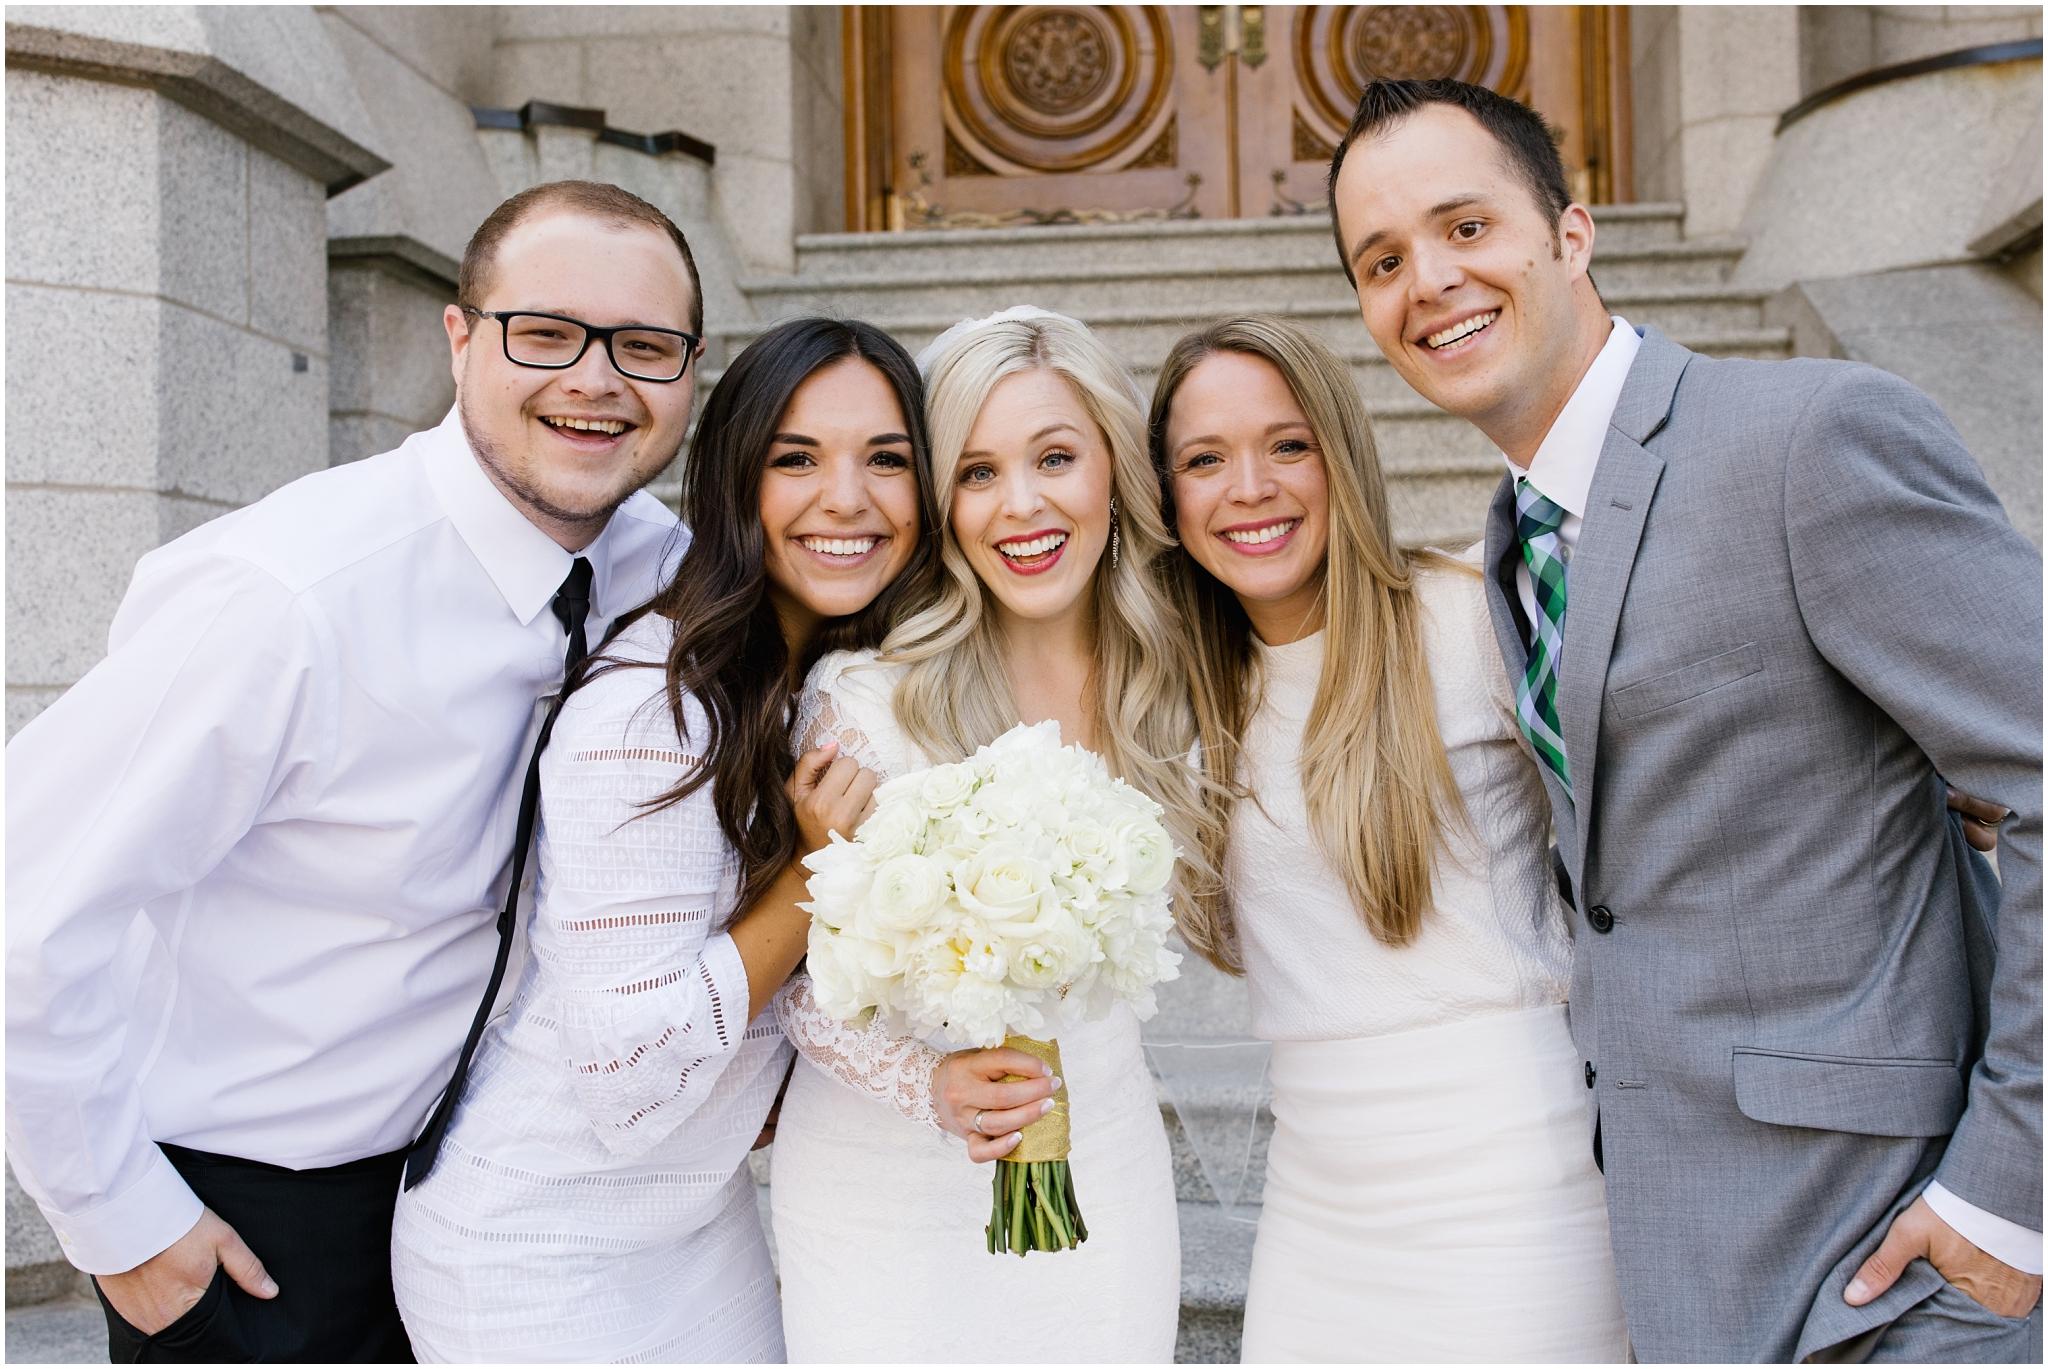 CherylandTyler-84_Lizzie-B-Imagery-Utah-Wedding-Photographer-Salt-Lake-City-Temple-Wells-Fargo-Building-Reception.jpg